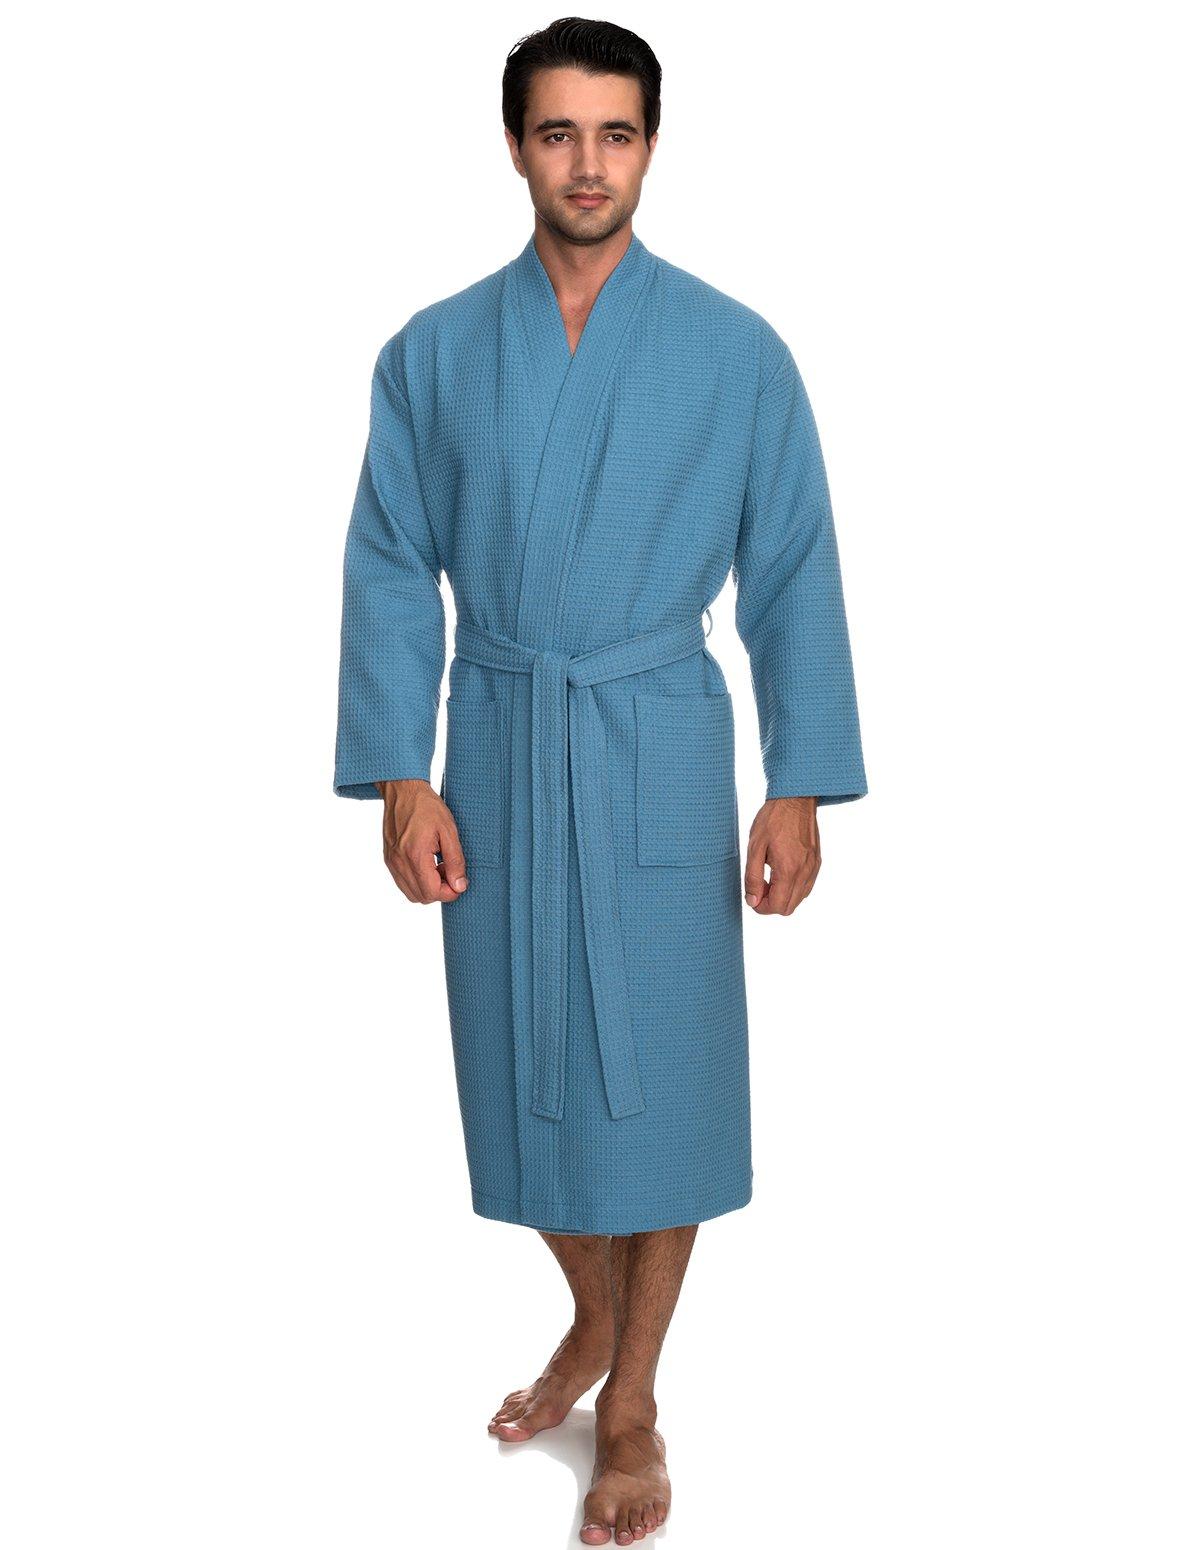 TowelSelections Men's Robe, Kimono Waffle Spa Bathrobe Large/X-Large Niagara Blue